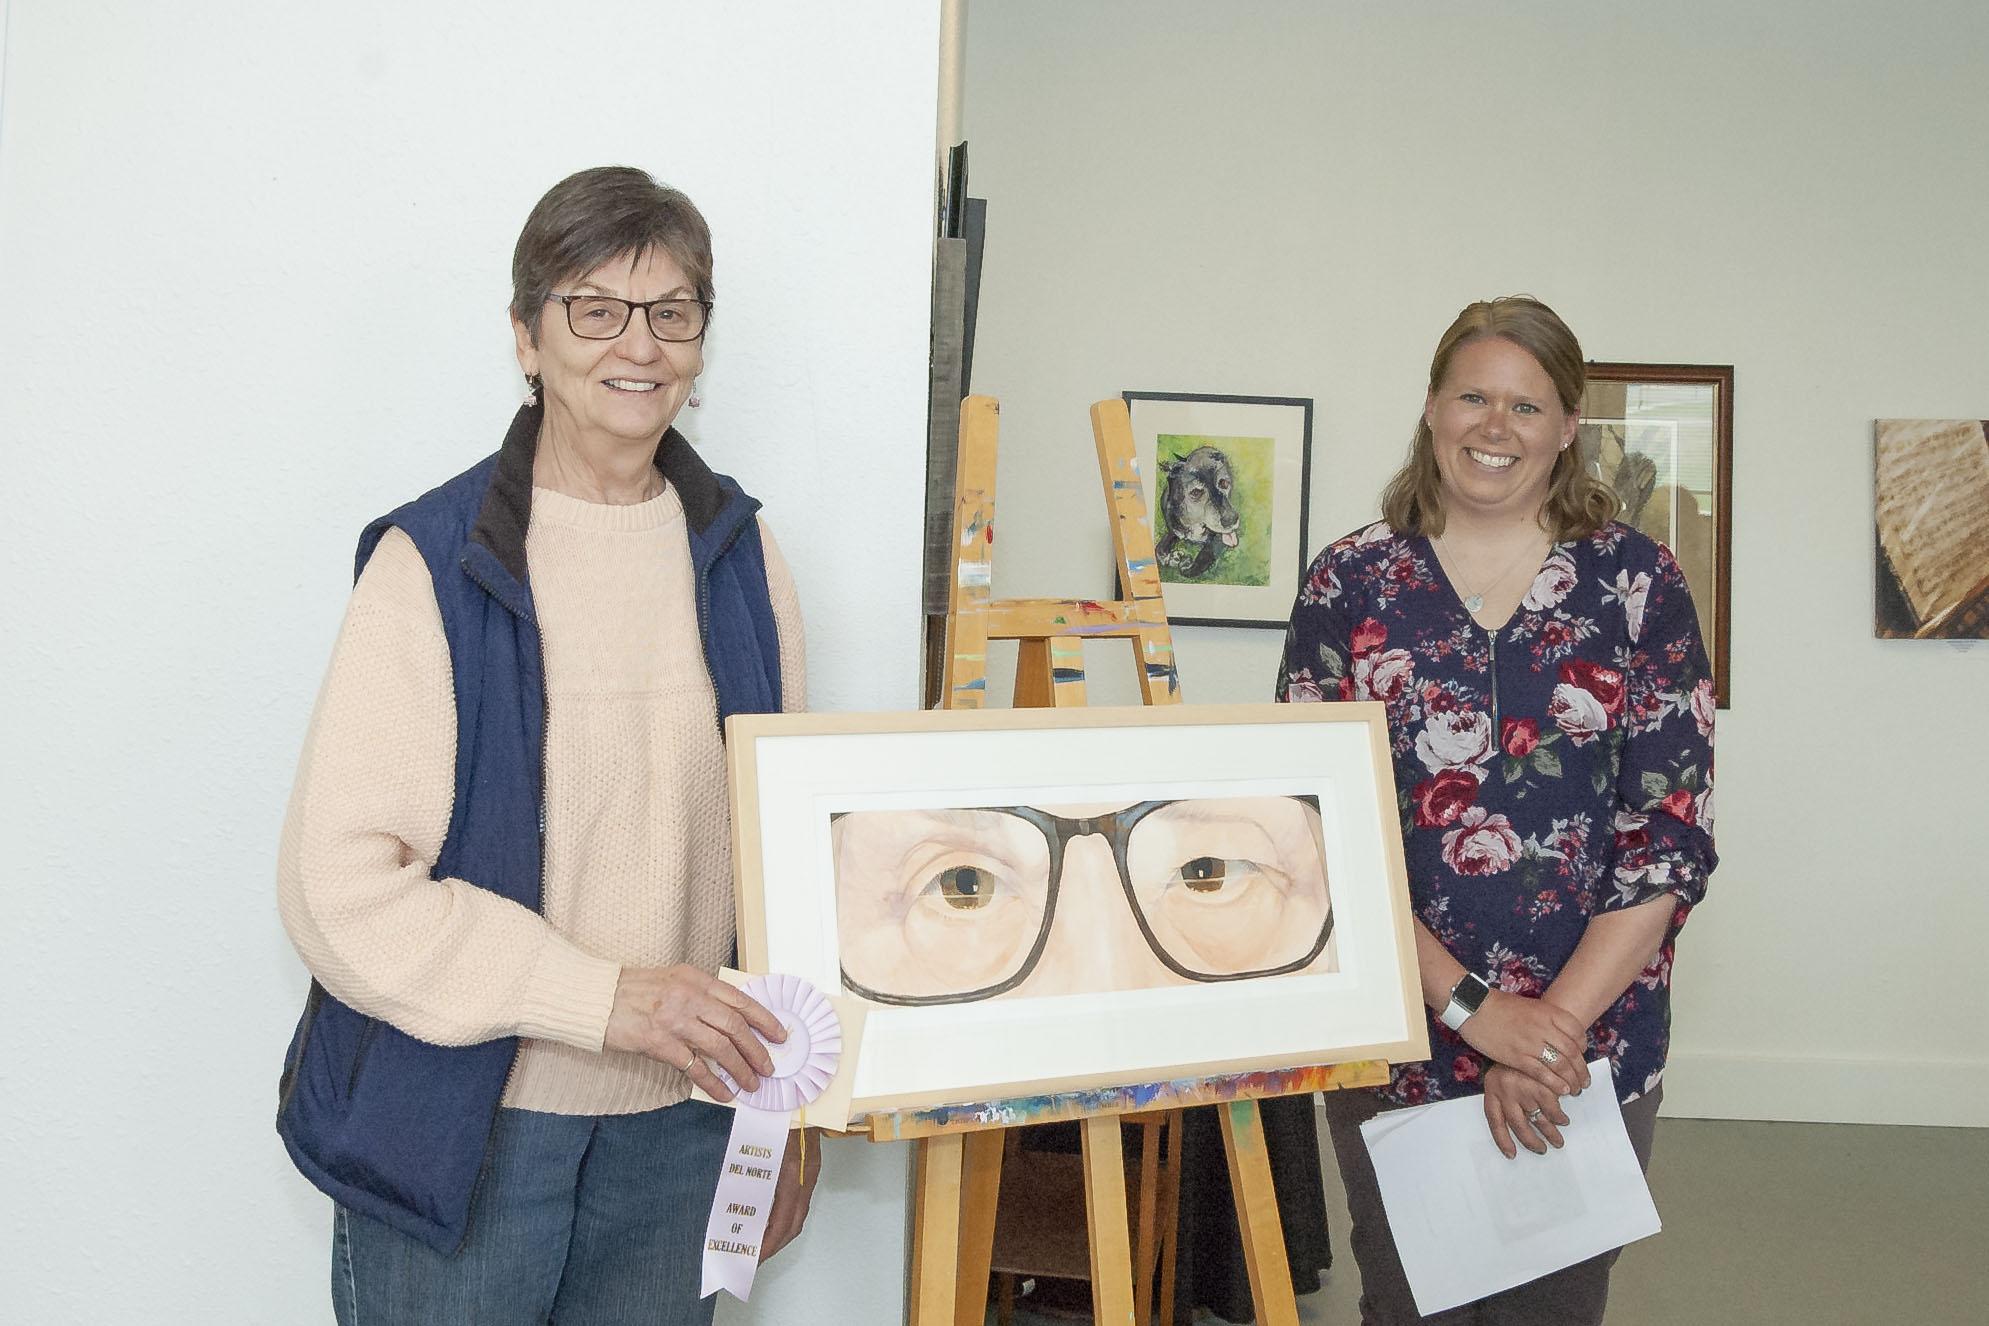 Award of Excellence_Watercolor_Nancy Amerson_ Shanna Slice_DSC_8632.jpg